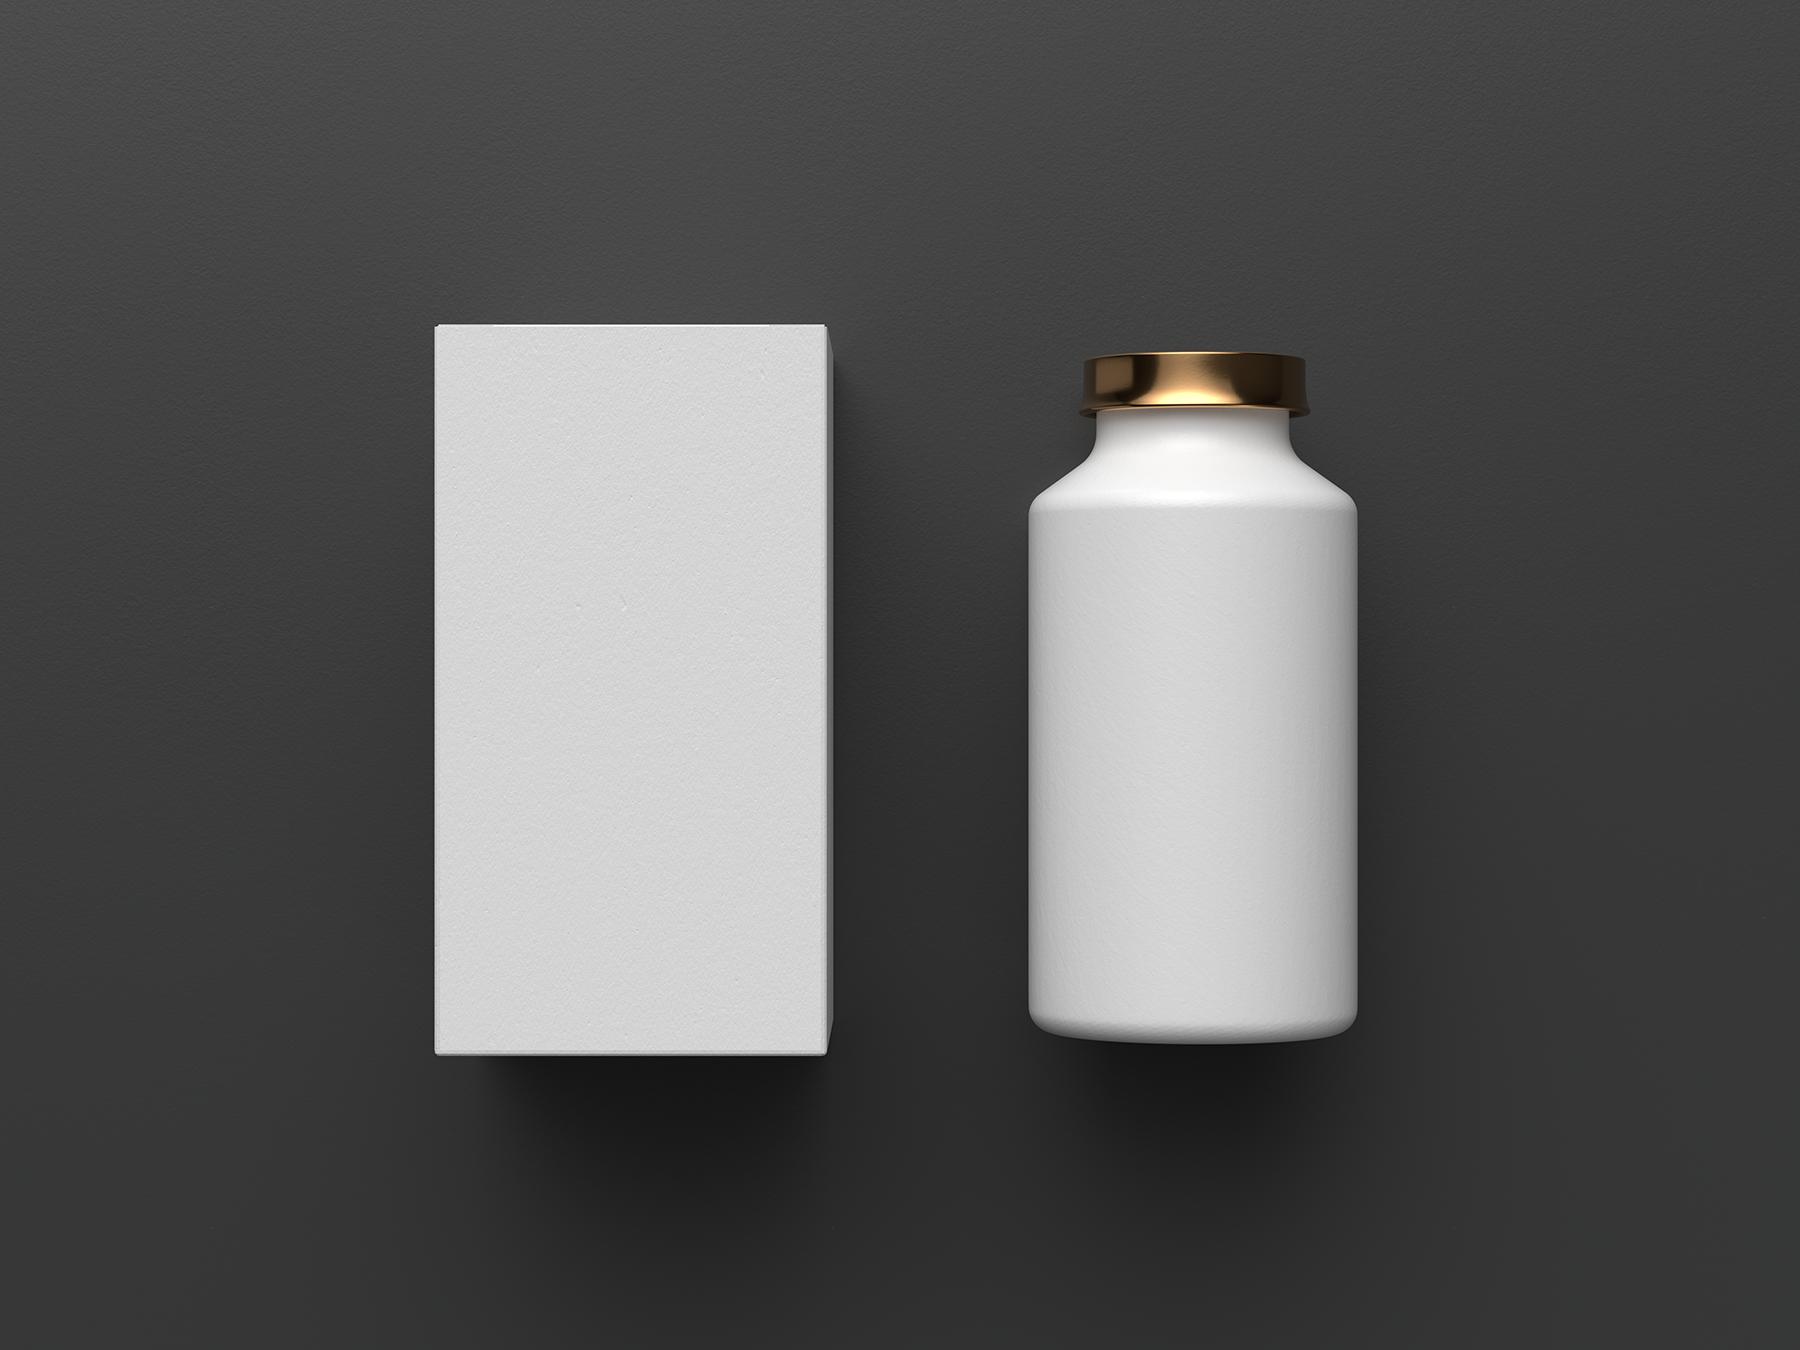 Free Cosmetics Bottle with Box Mockup